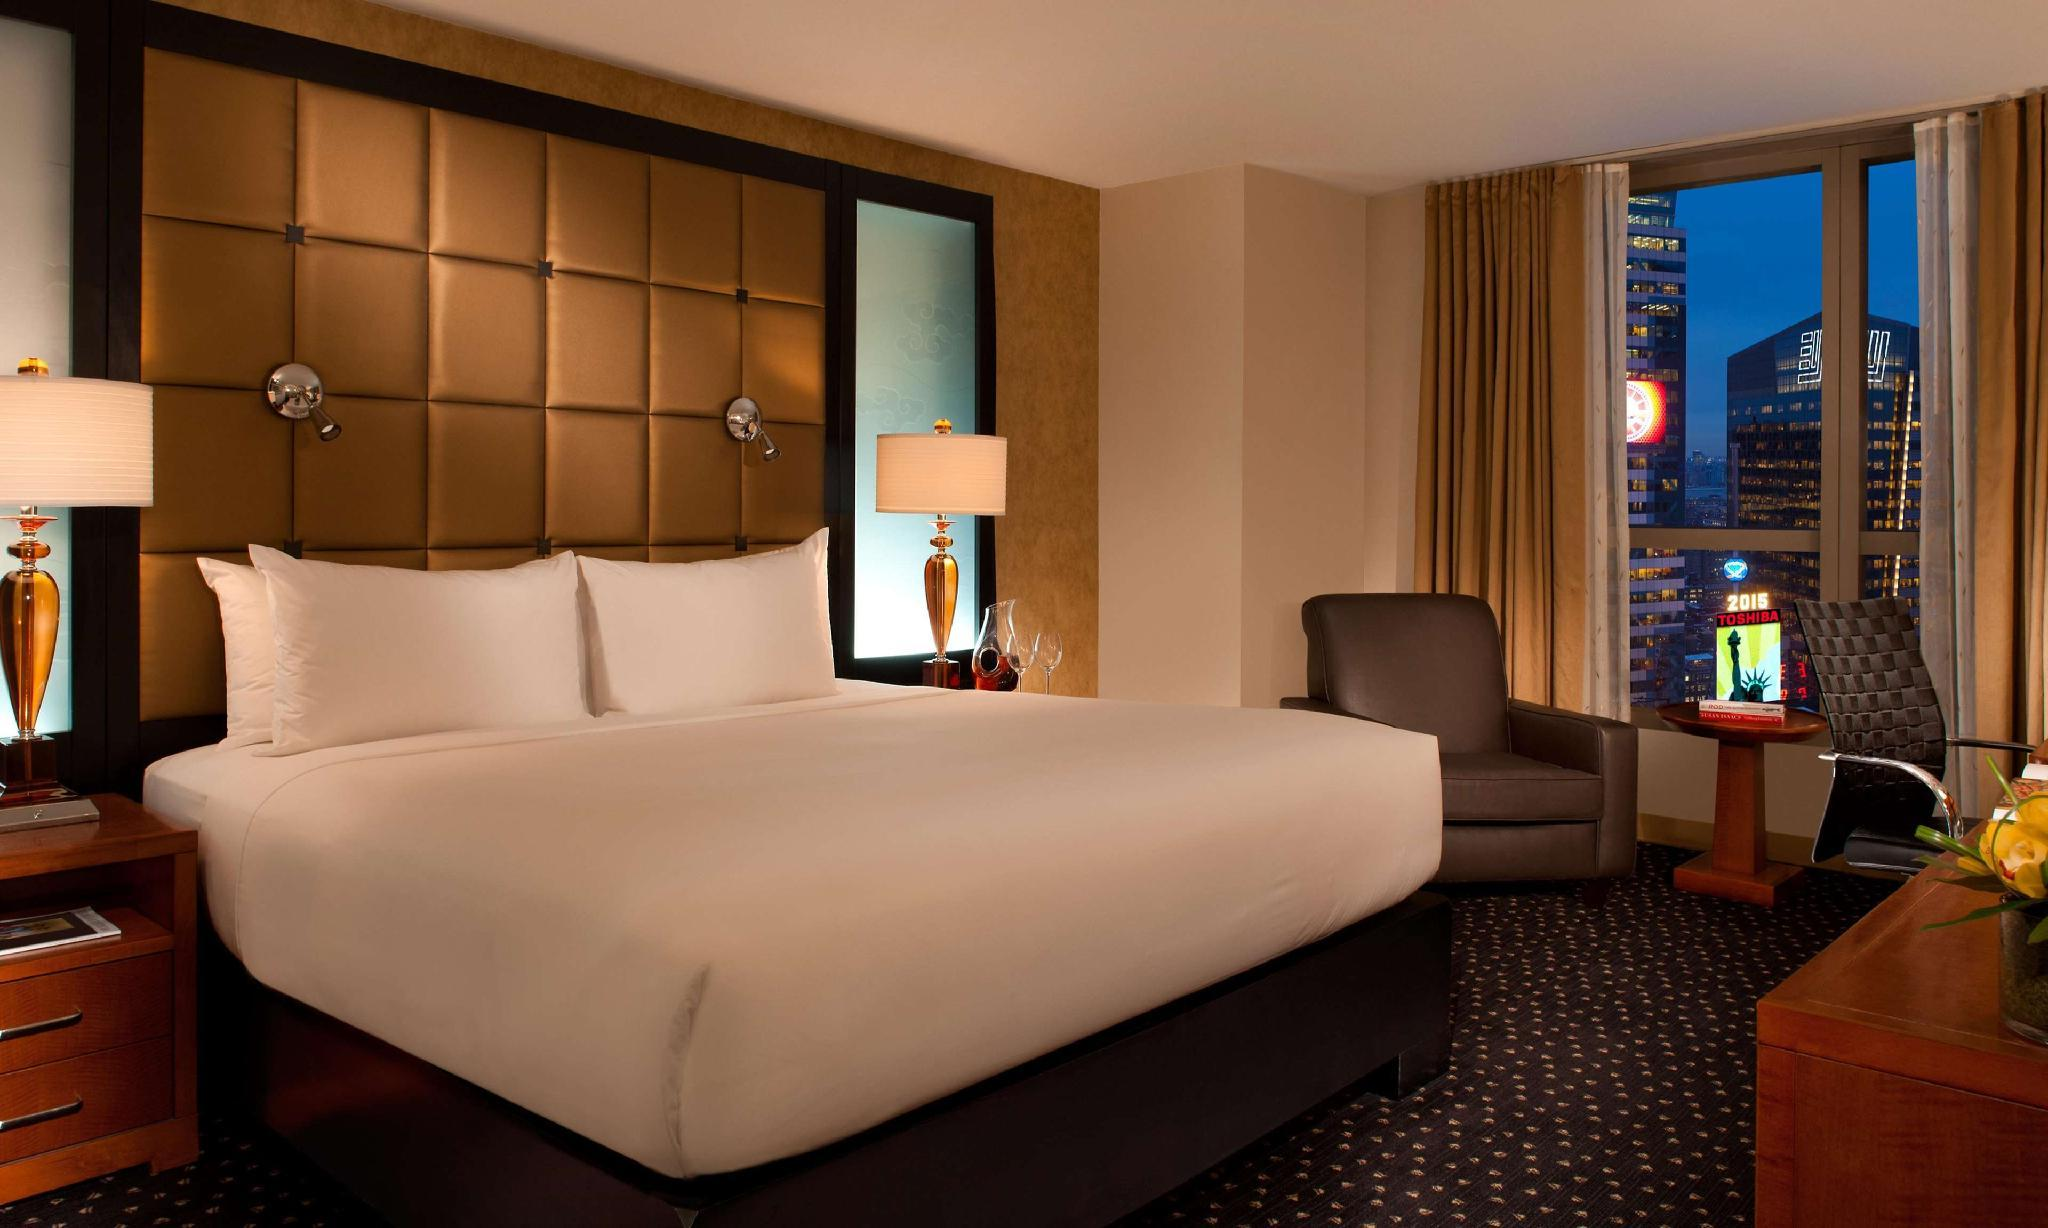 Millennium Times Square New York Hotel New York Ny Deals Photos Reviews